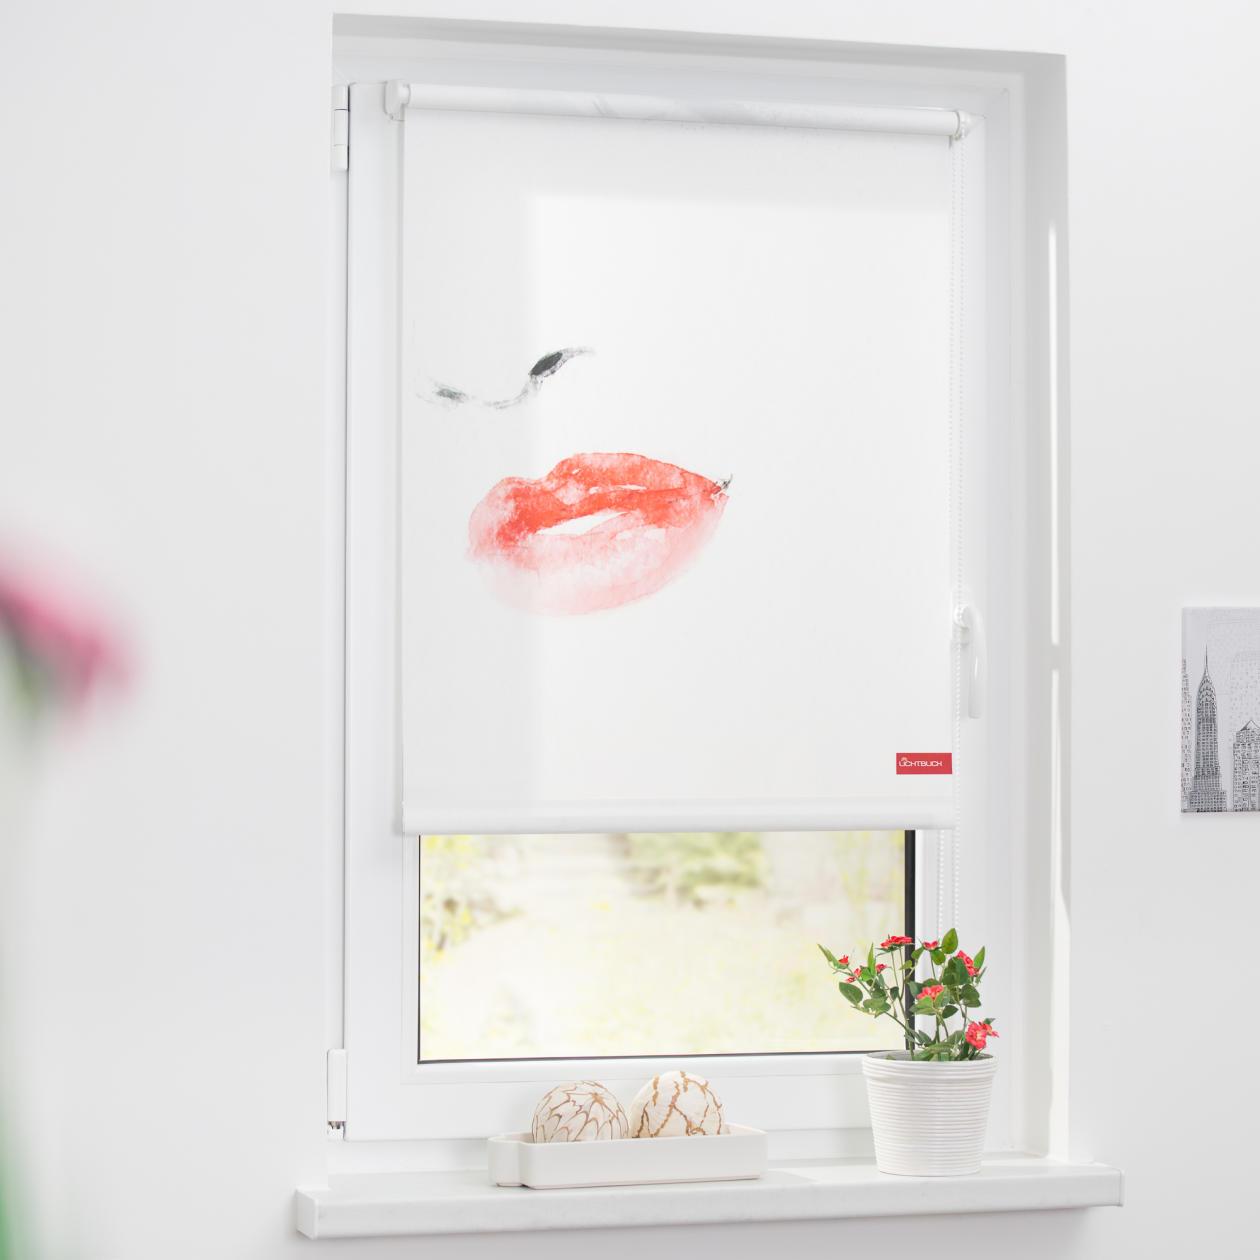 rollo klemmfix ohne bohren blickdicht face wei lichblick shop. Black Bedroom Furniture Sets. Home Design Ideas